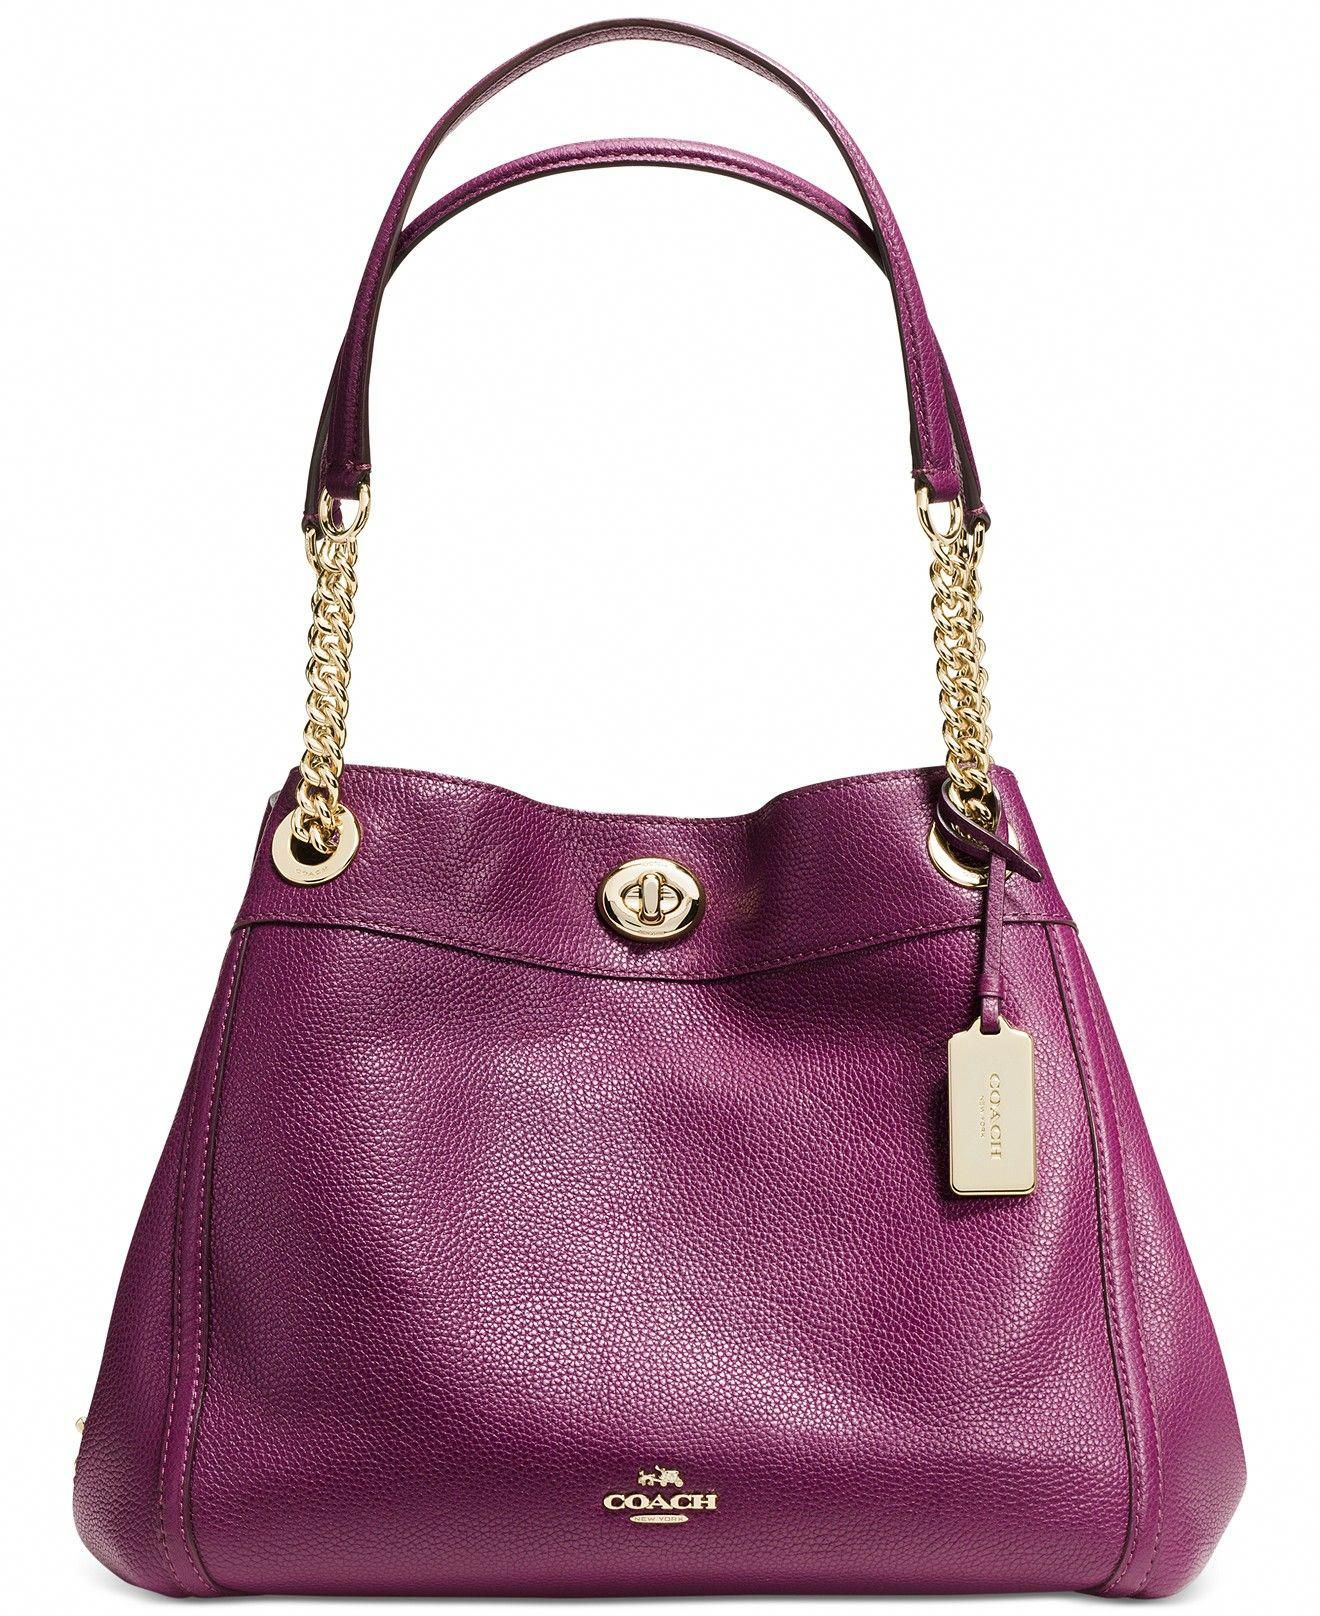 ba063a1c5d COACH TURNLOCK EDIE SHOULDER BAG IN PEBBLE LEATHER - Handbags   Accessories  - Macy s  Designerhandbags